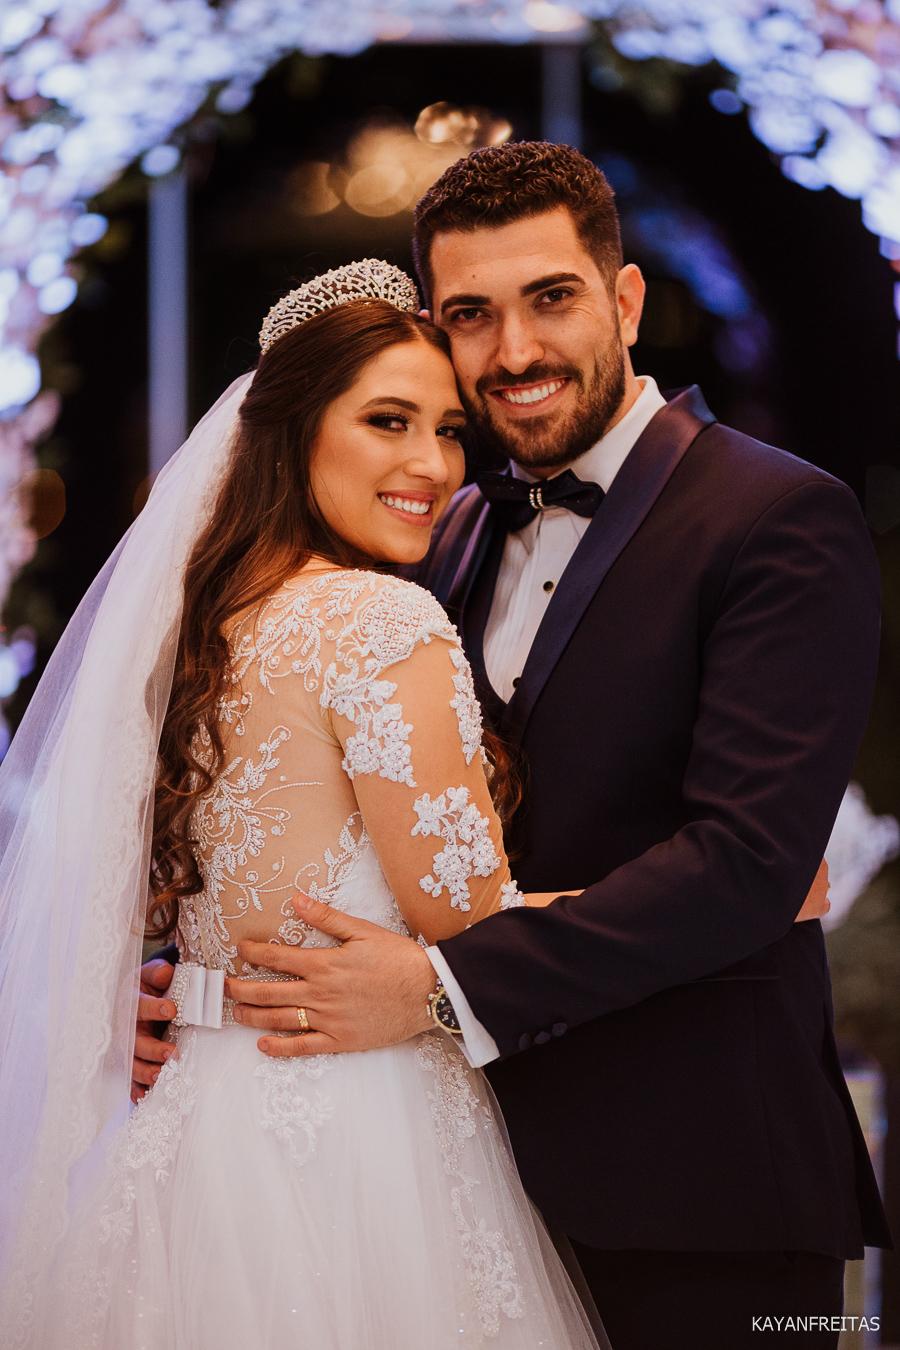 casamento-lic-florianopolis-ariane-diogo-0081 Casamento Ariane e Diogo - LIC Florianópolis